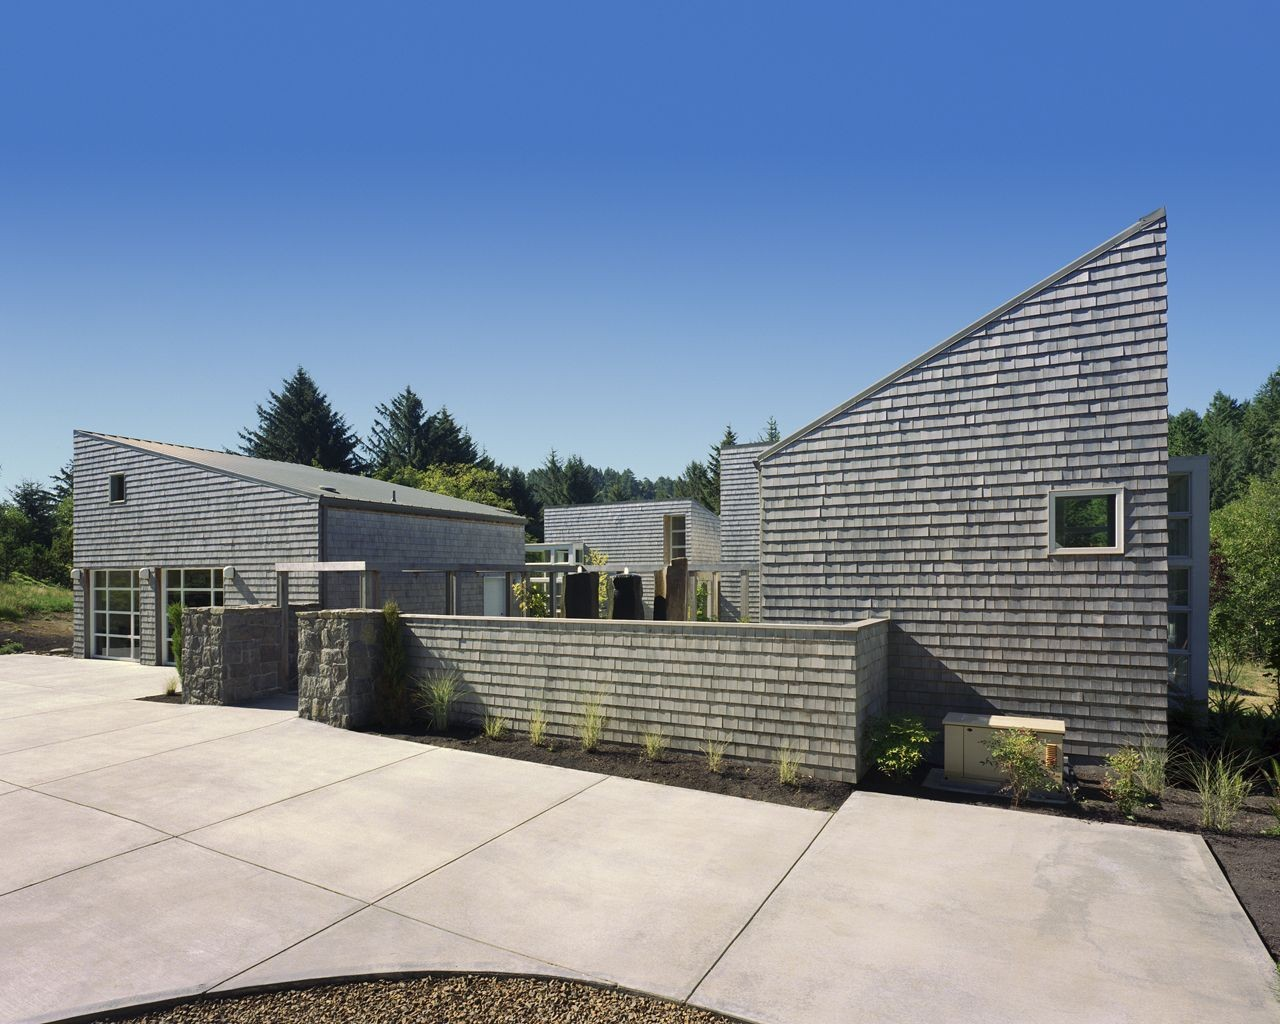 Caring Cabin / TVA Architects, Inc.